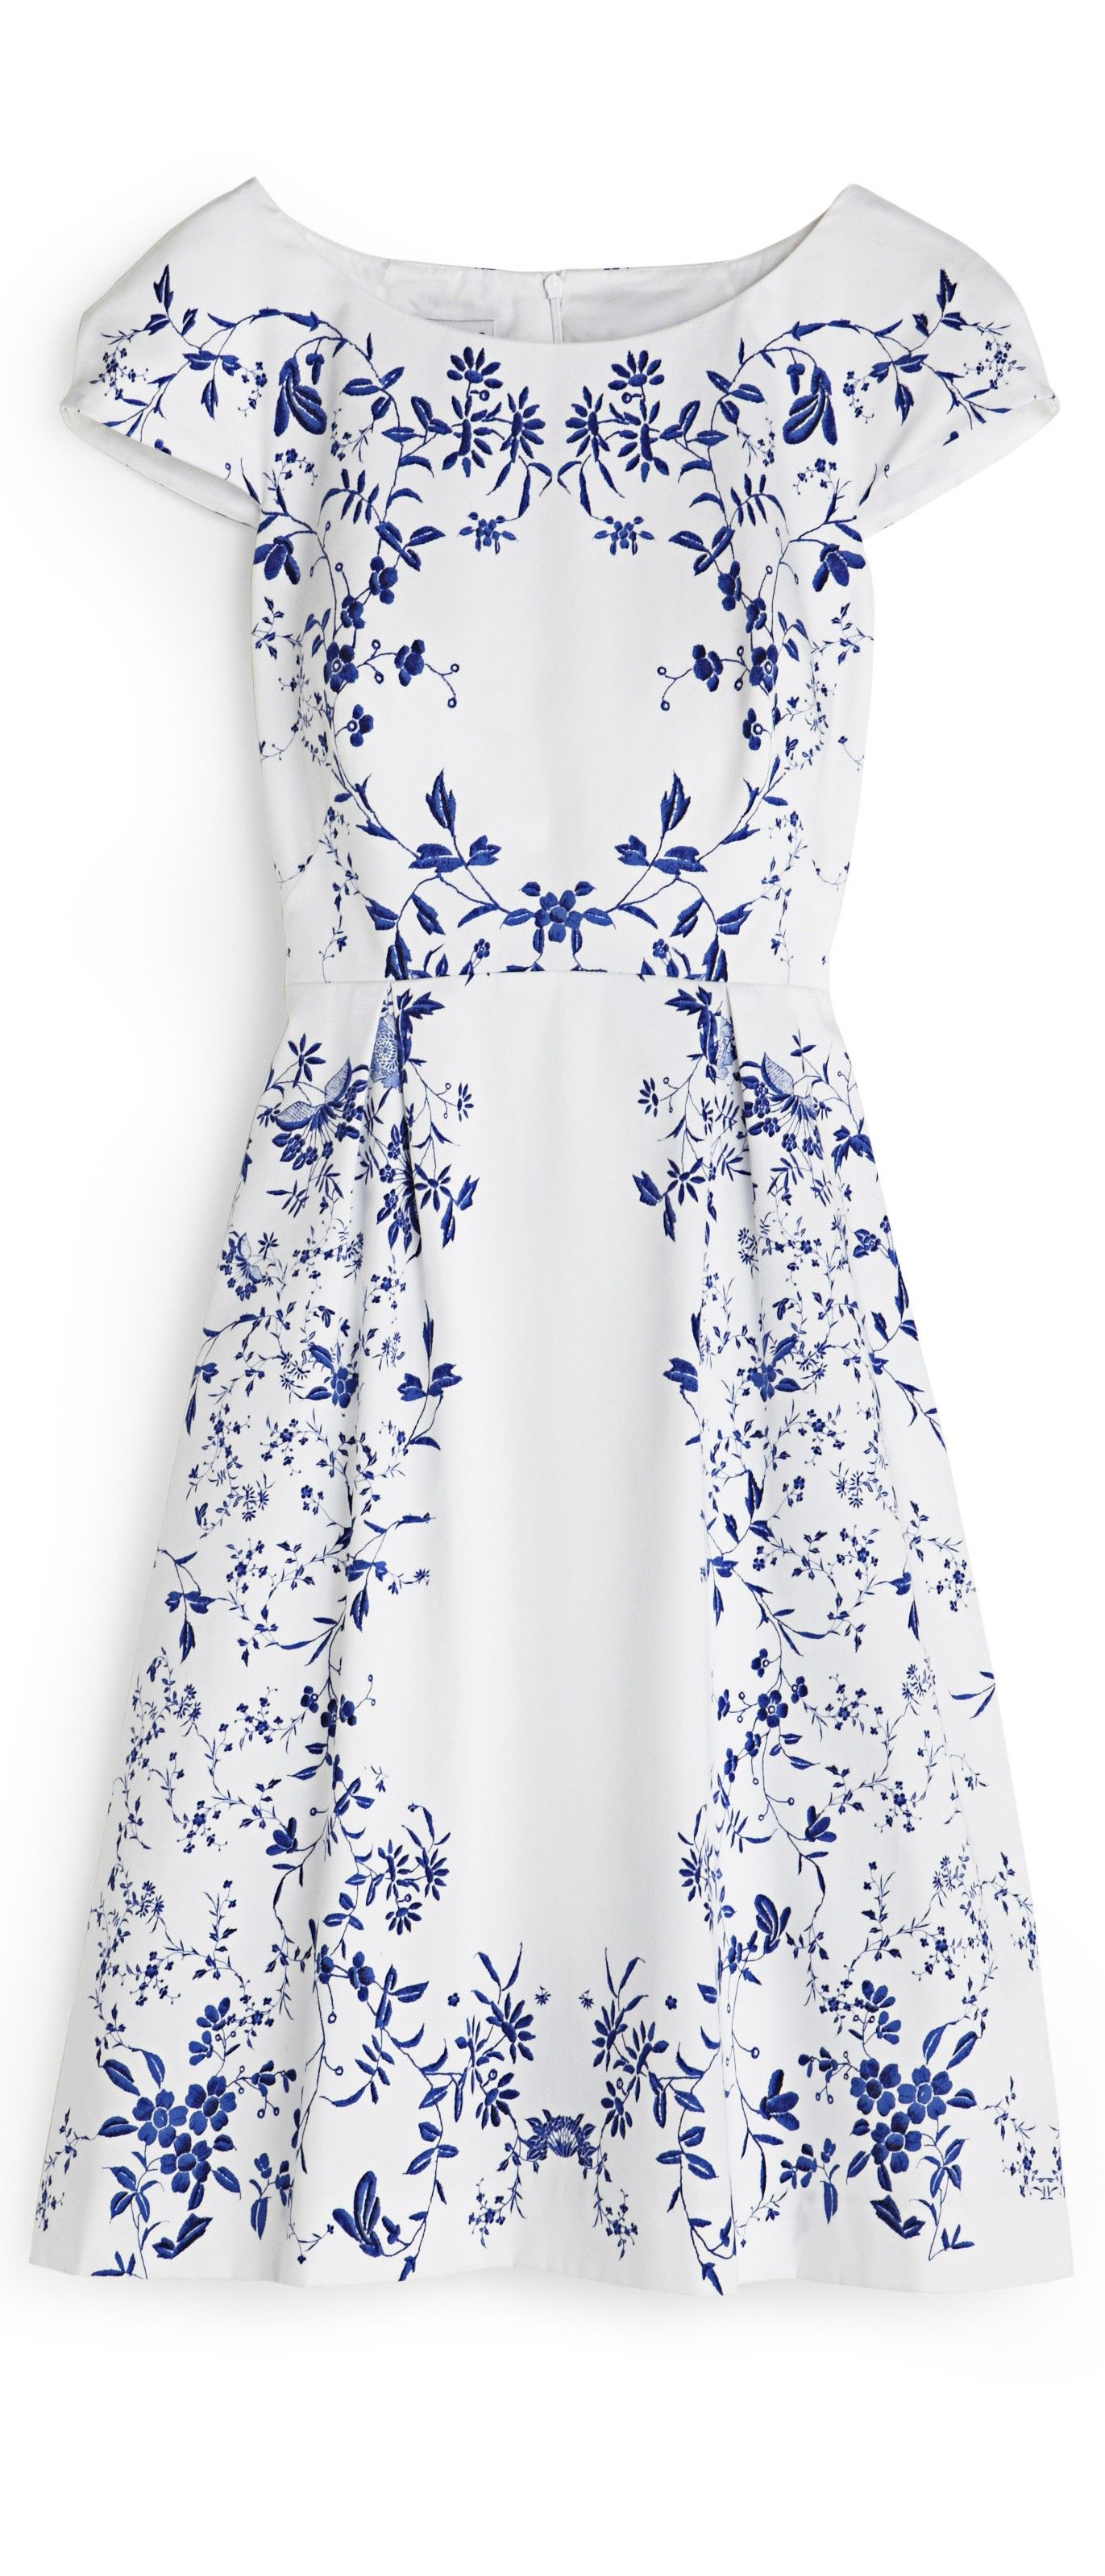 Blue and white floral wedding dress for older brides hobbs prshots blue and white floral wedding dress for older brides hobbs prshots izmirmasajfo